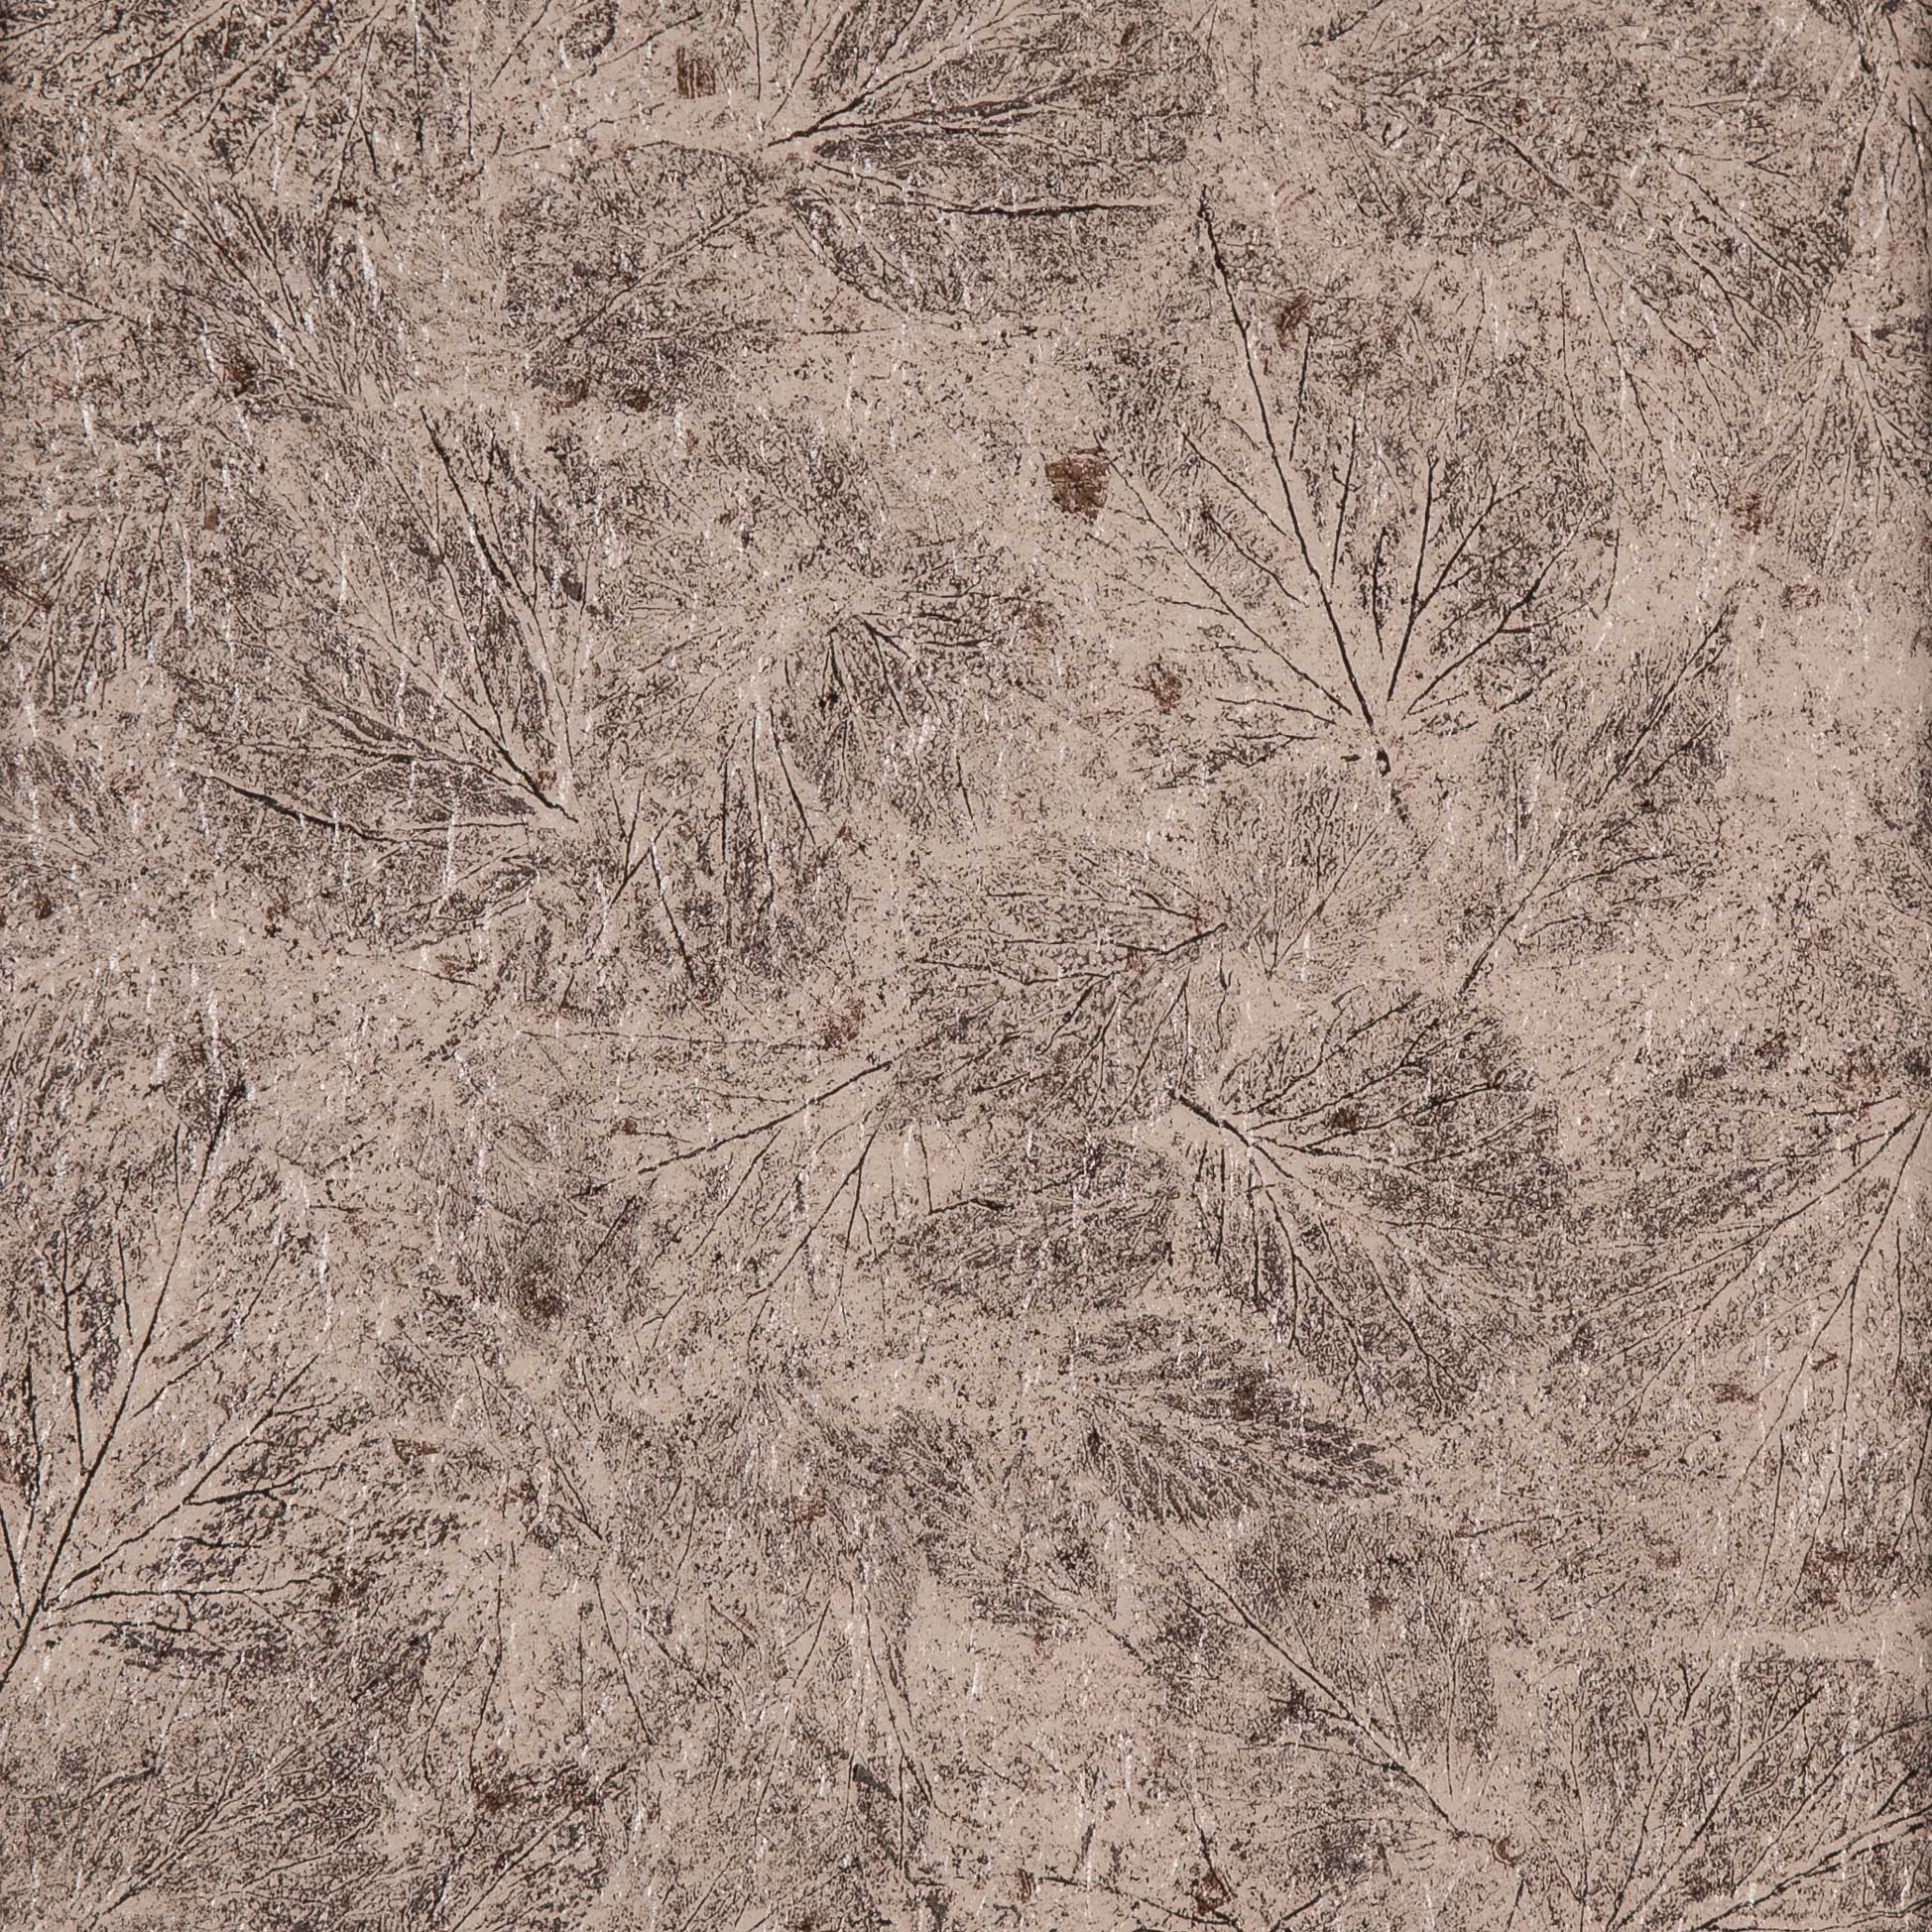 Duradek Colours and Styles Forest Floor Alder | Citywide Sundecks and Railings